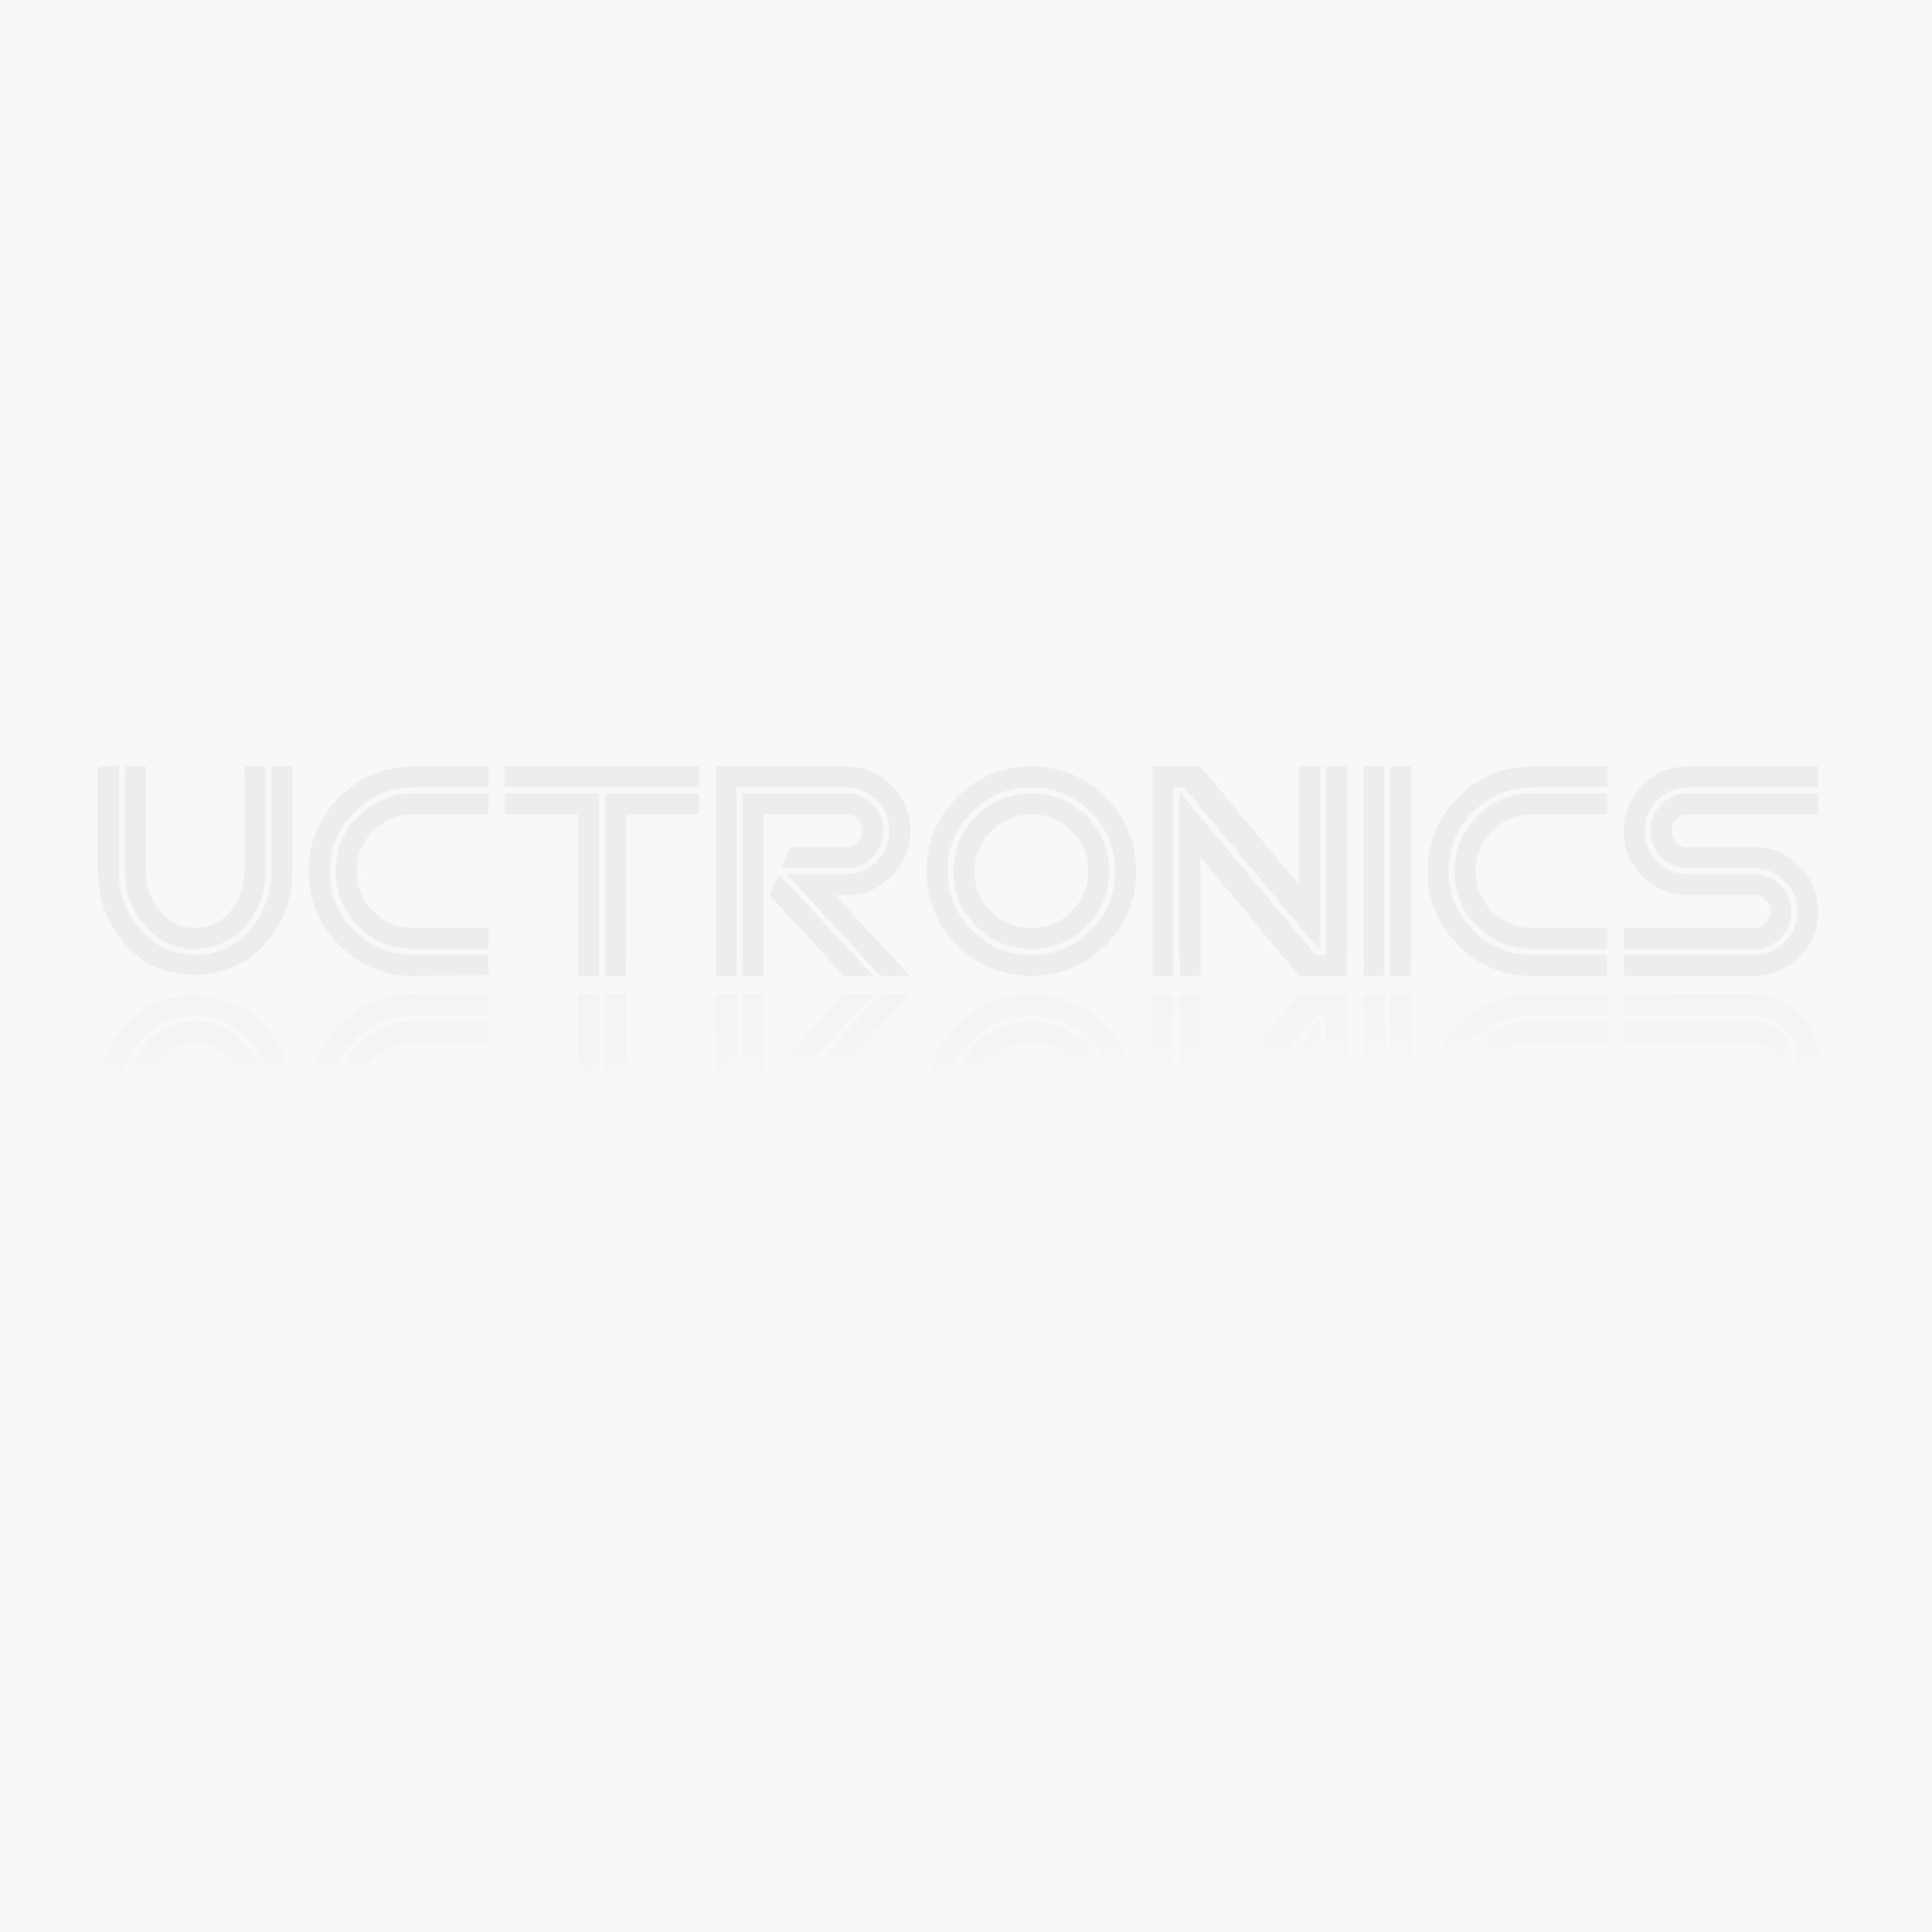 L9110 Stepper Motor Driver Controller Board for arduino